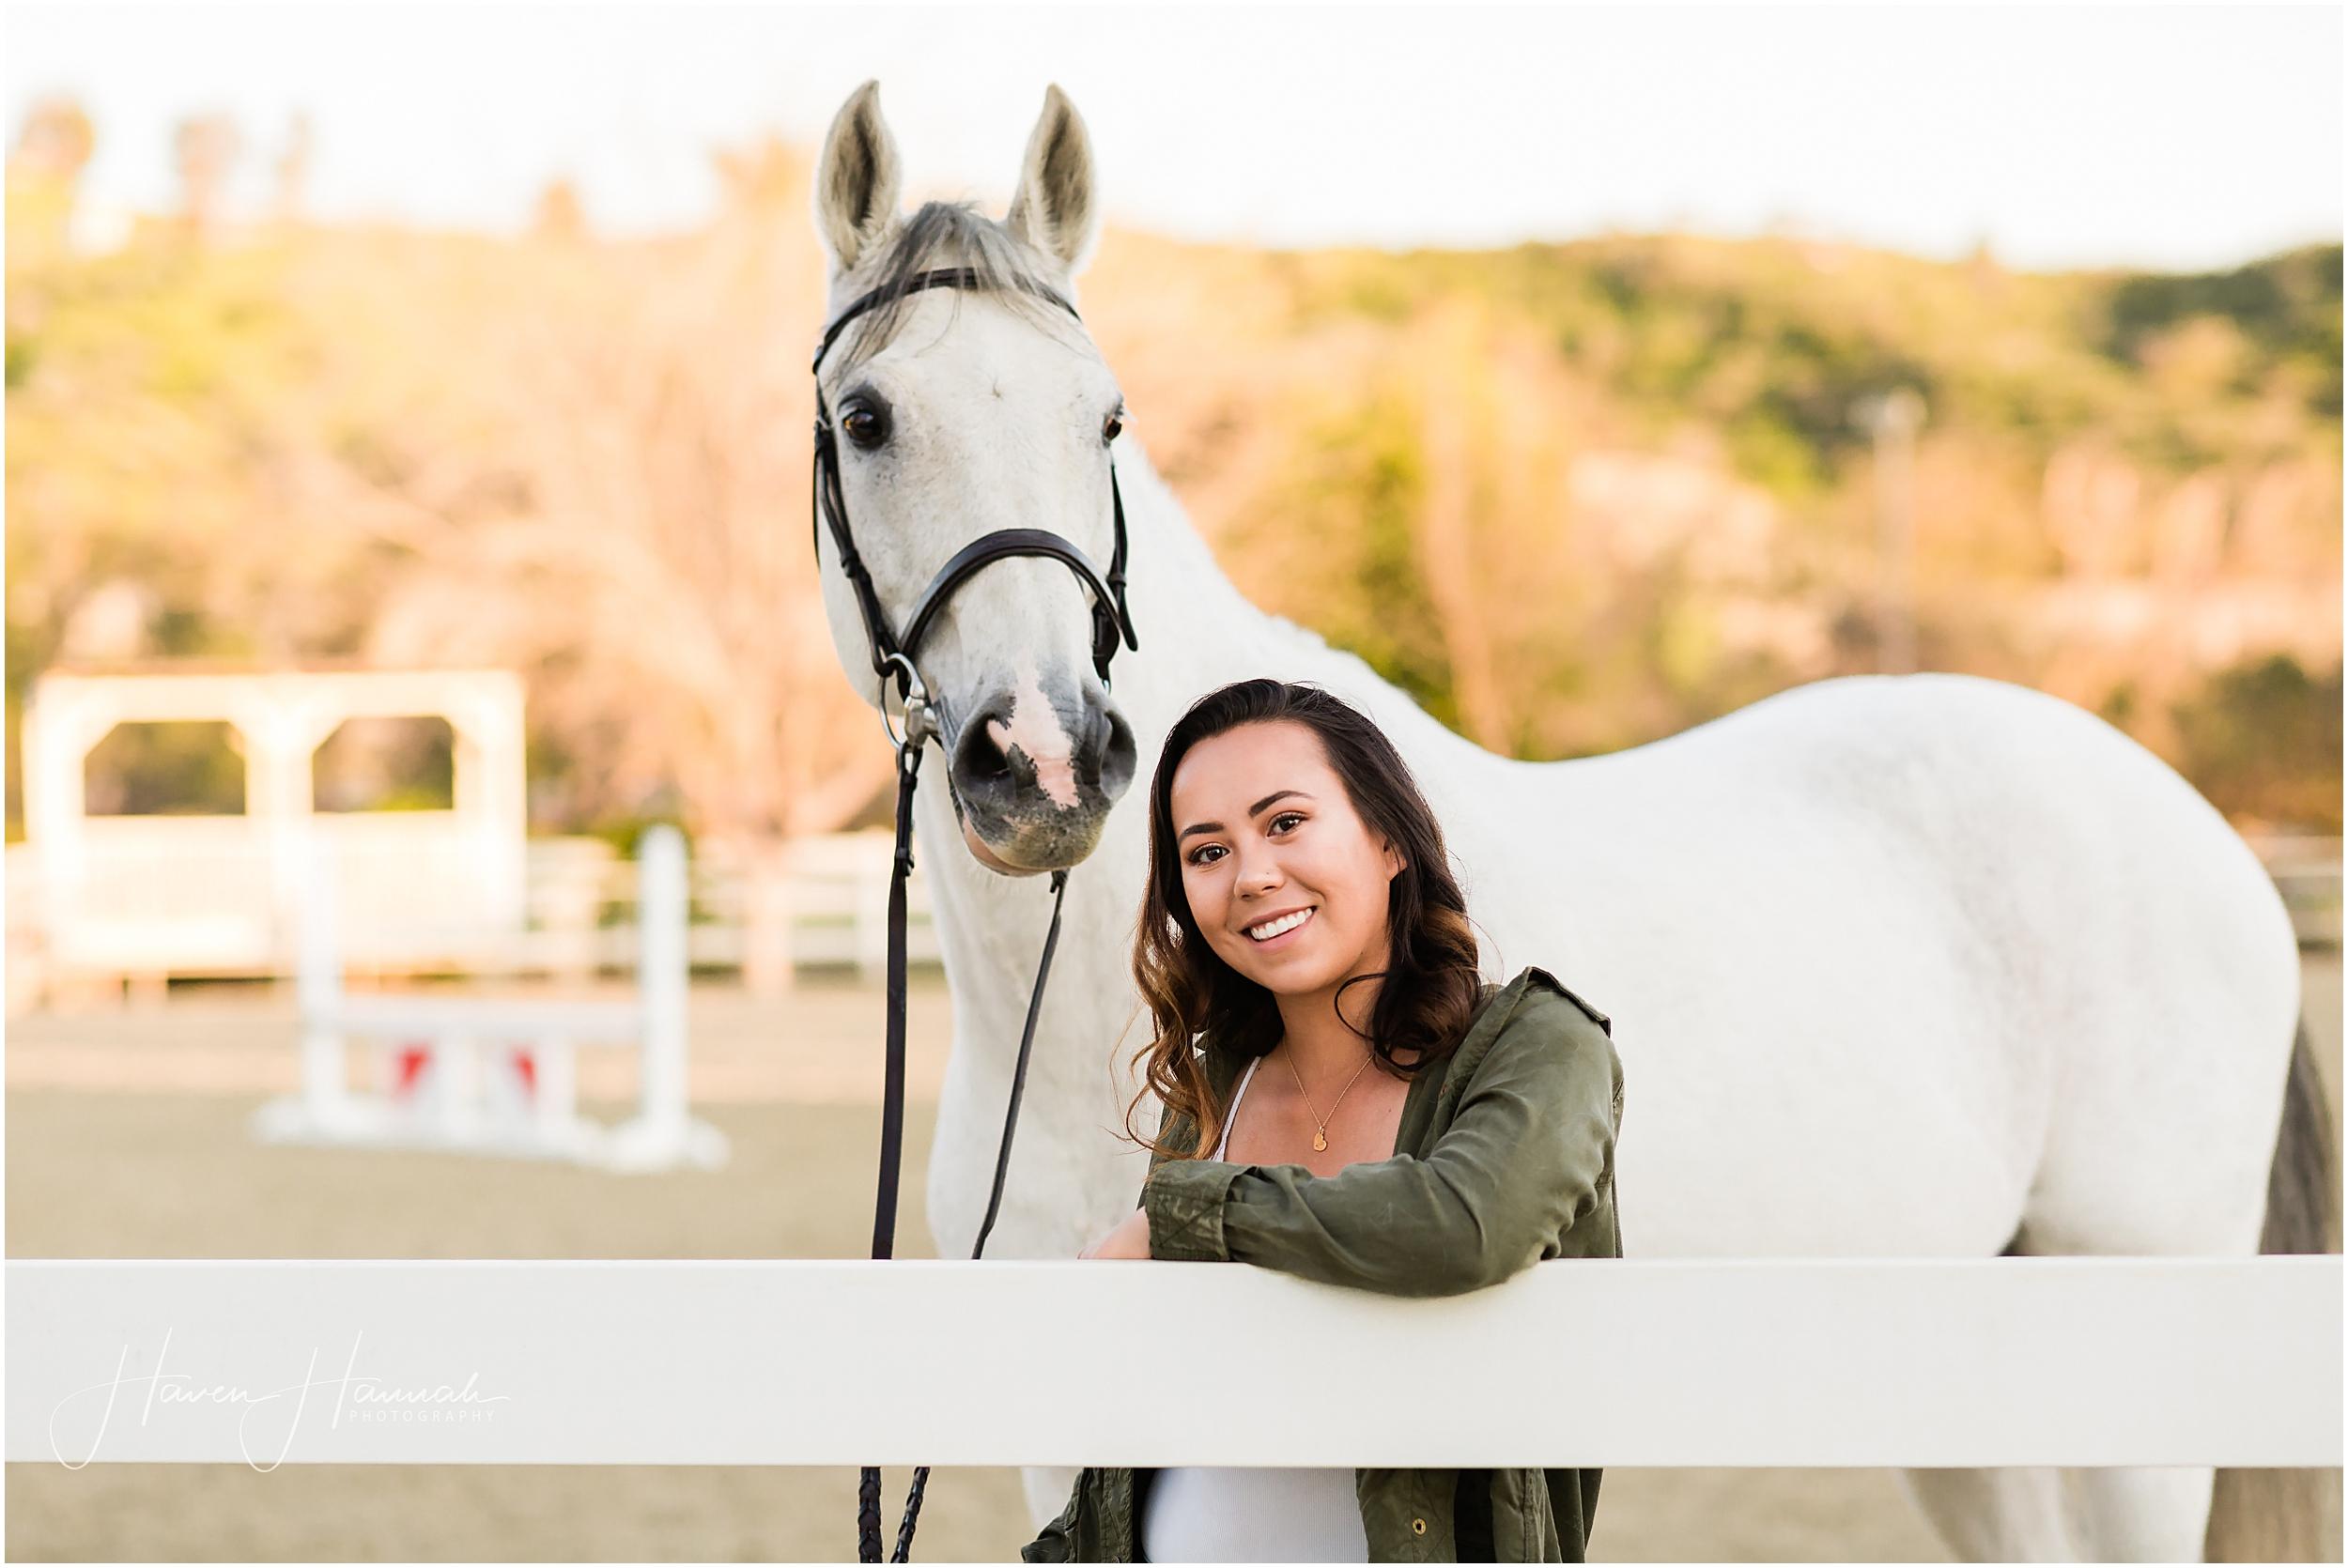 horse-and-rider-photos